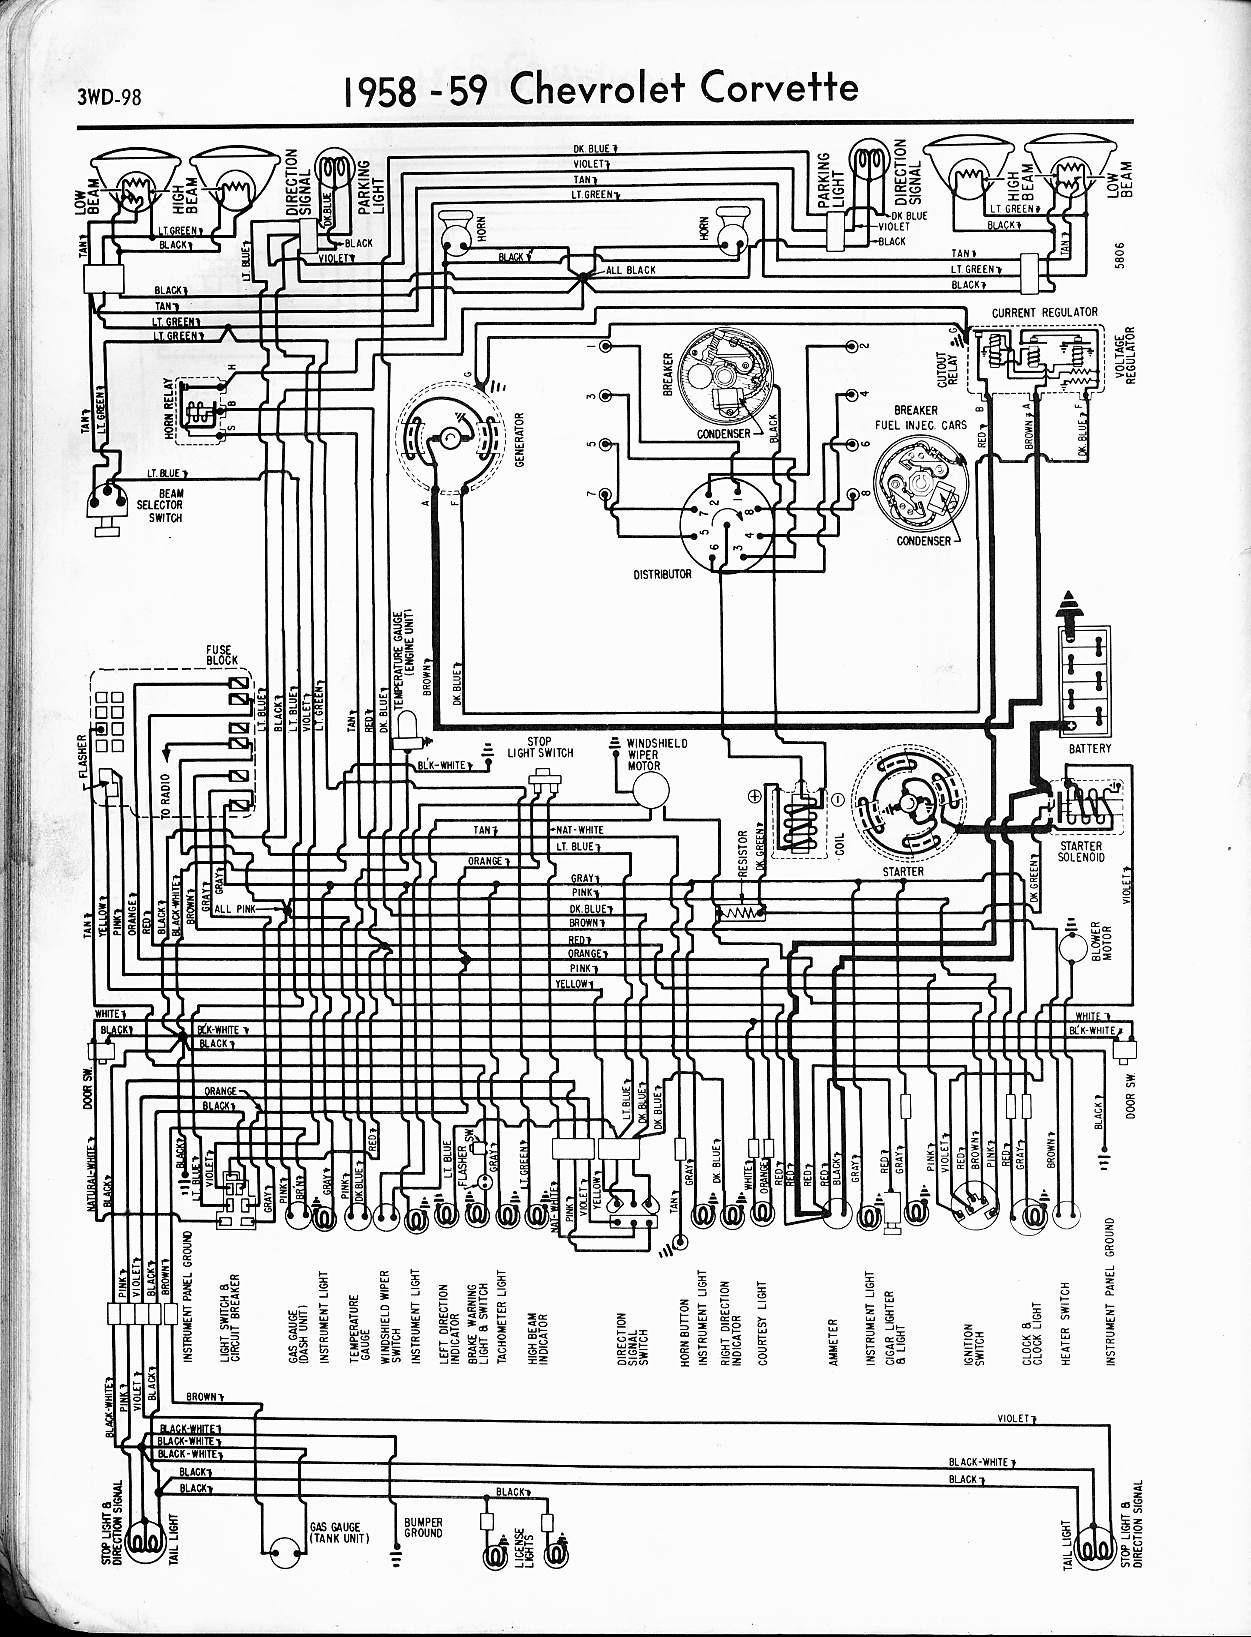 1977 chevy truck wiring diagram new wiring diagram image rh mai reasurechest